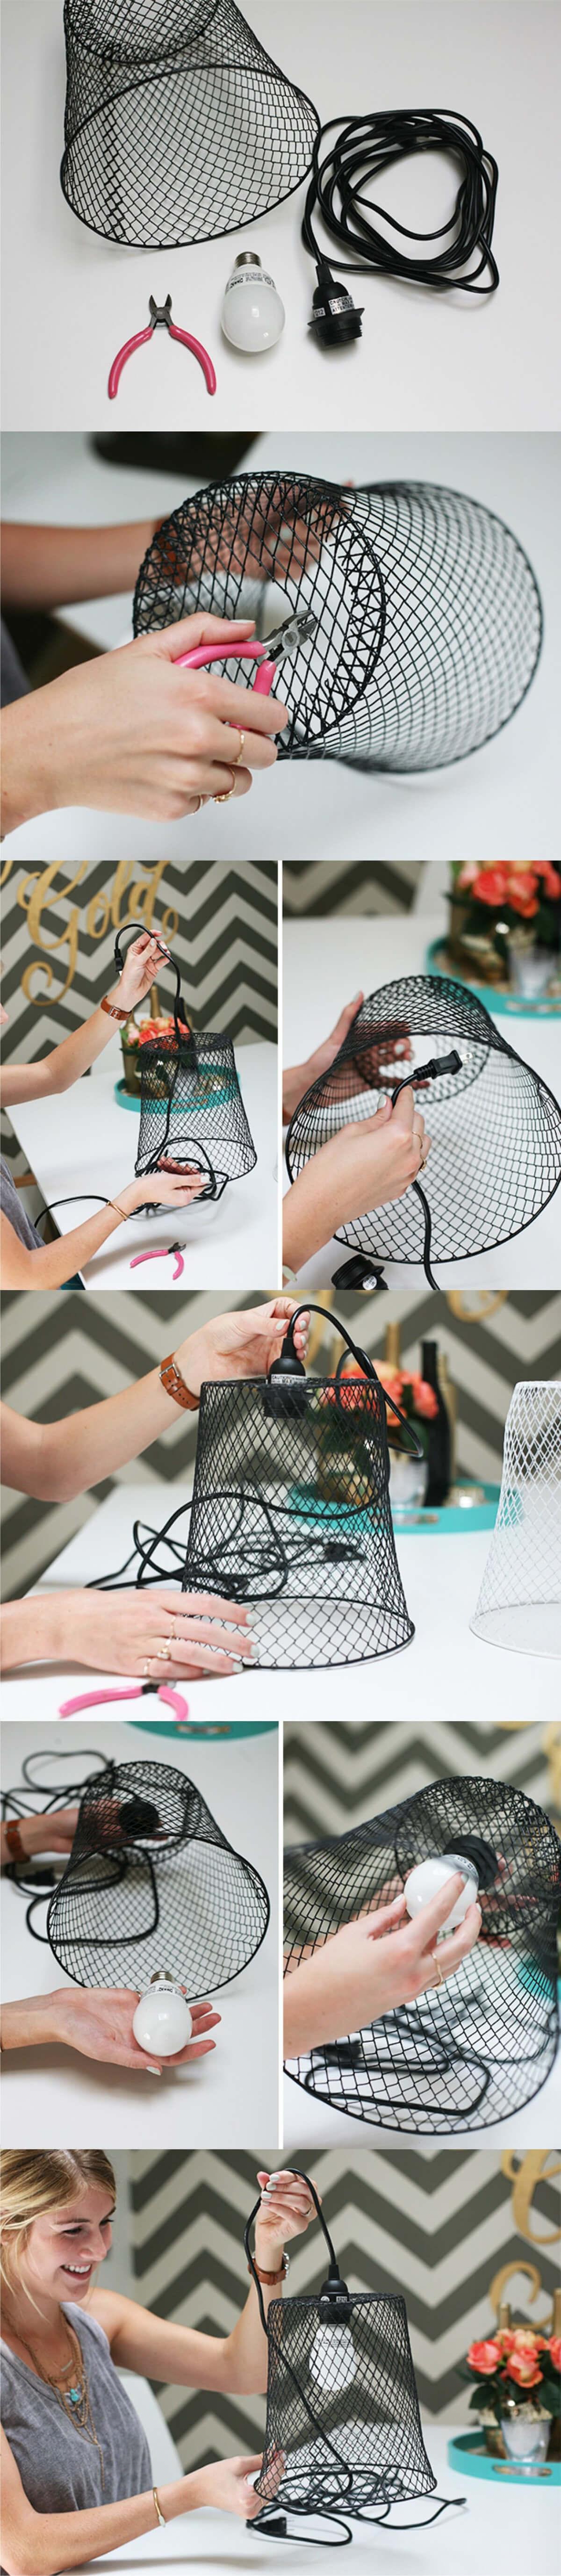 Mesh Basket Lampshade